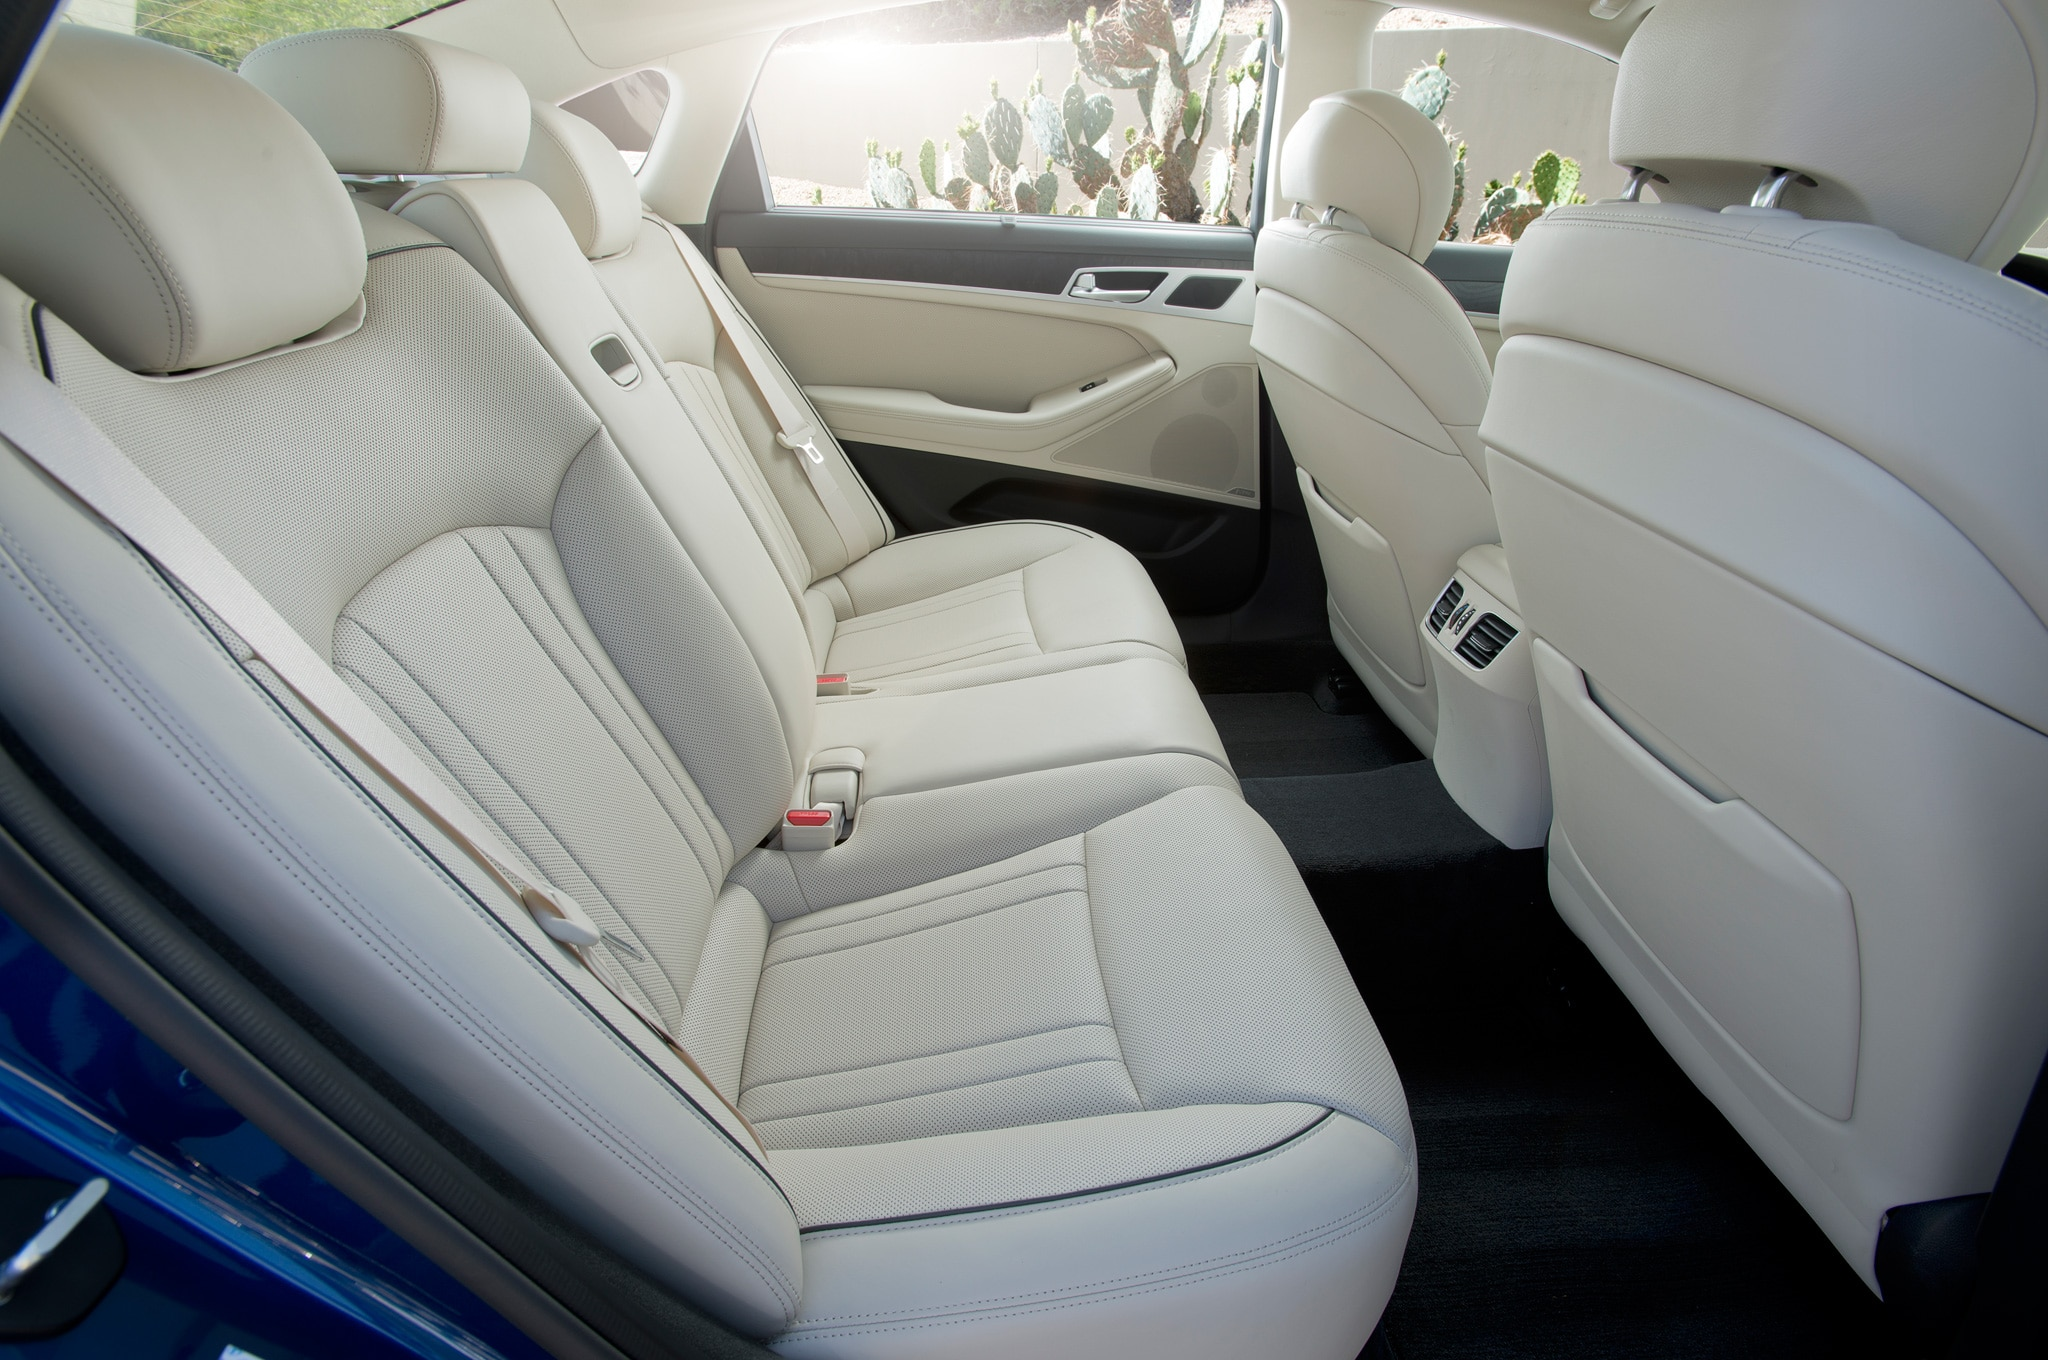 2015 hyundai genesis review automobile magazine 2018 Hyundai Genesis Interior show more